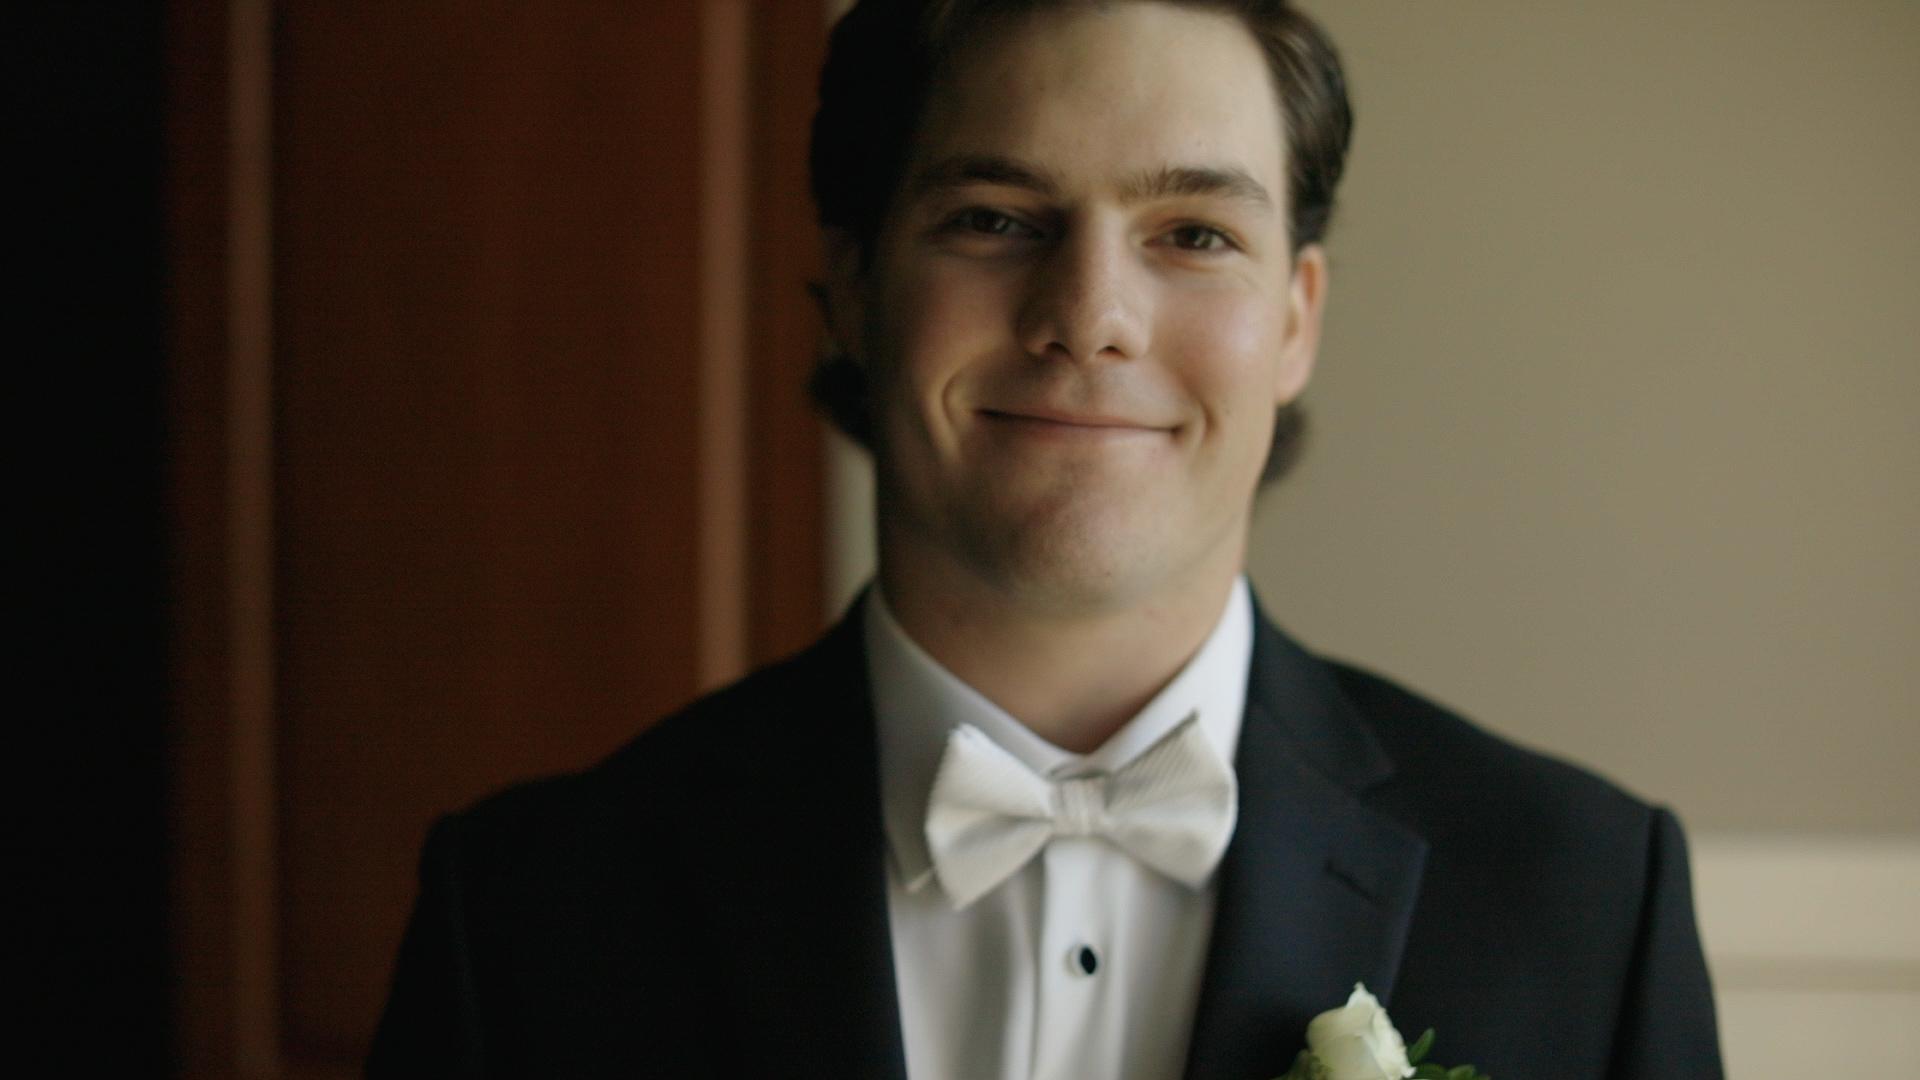 Covington Wedding Video - Bride Film - Groom Style